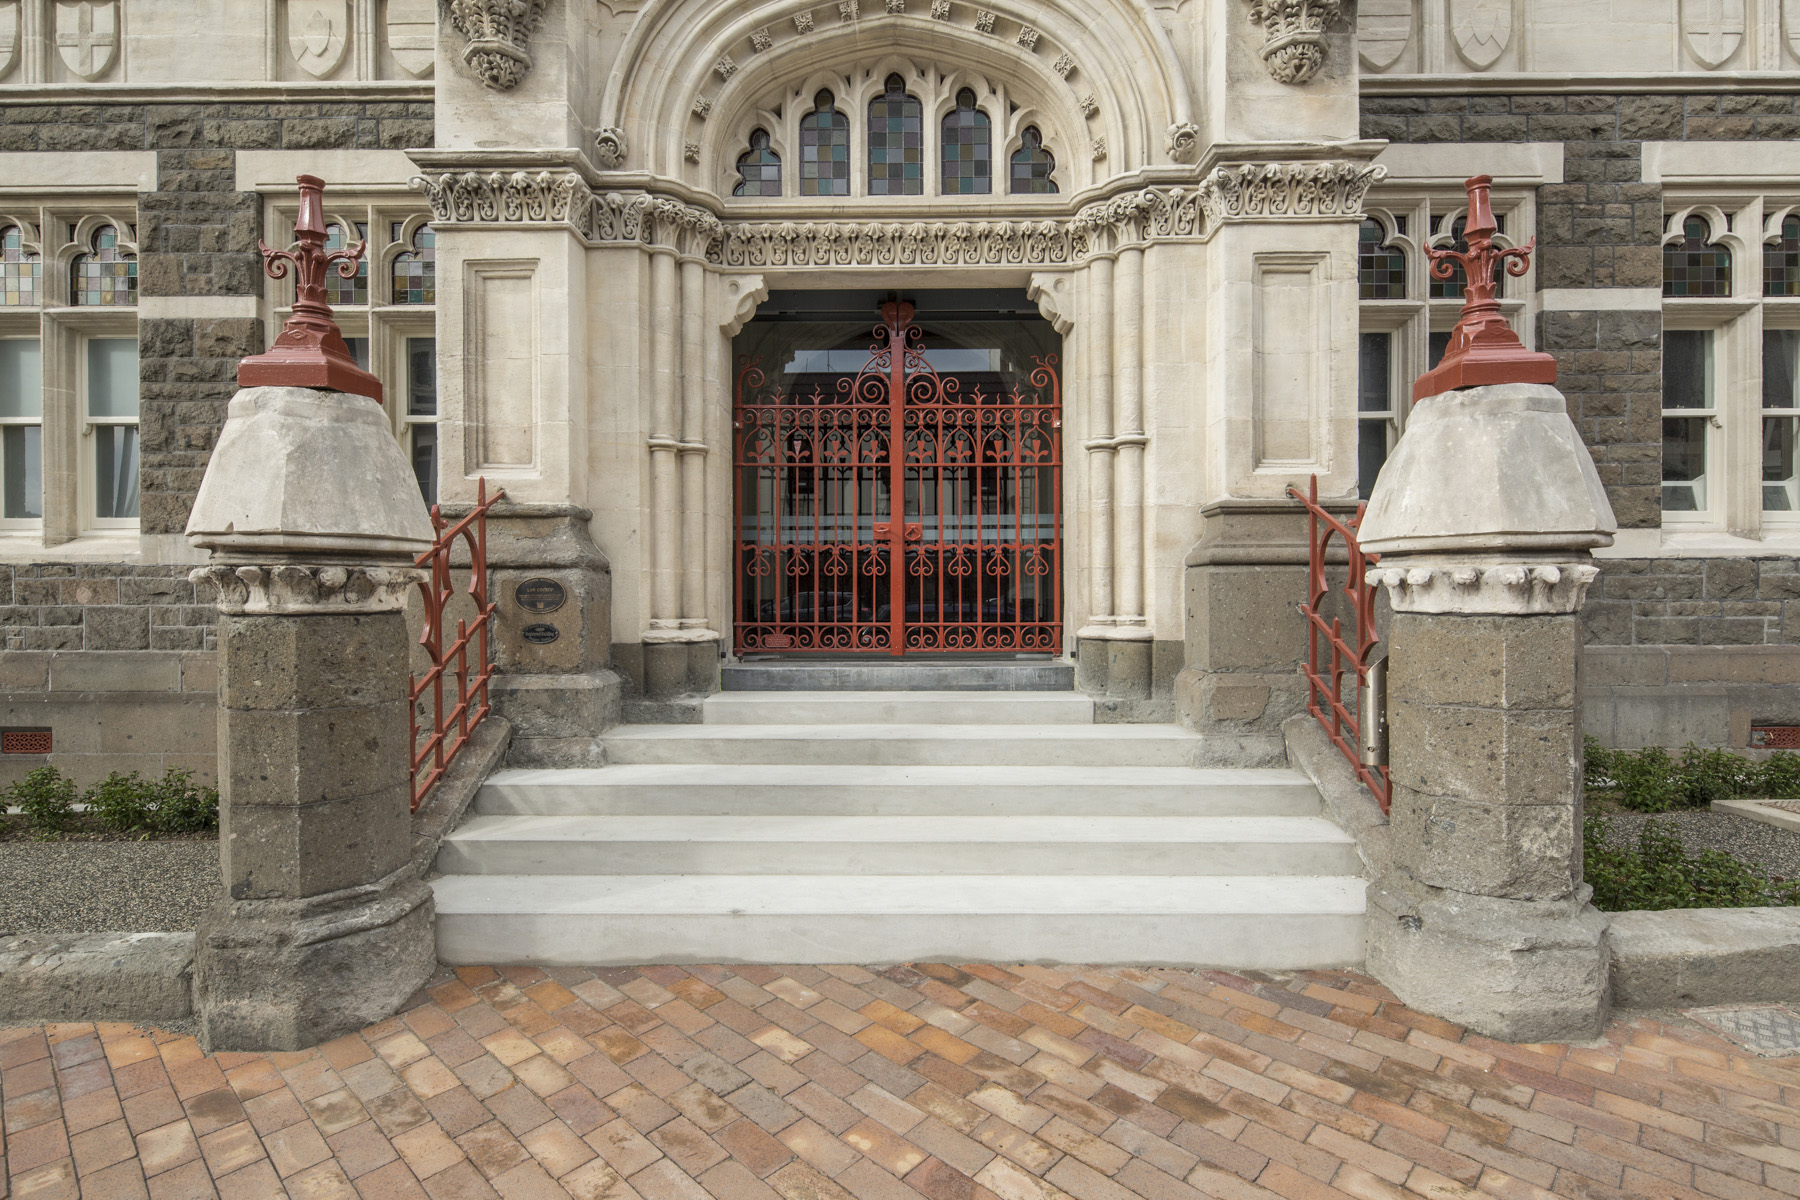 Dunedin Law Courts_Stuart Street Entrance_3 of 9 low res.jpg